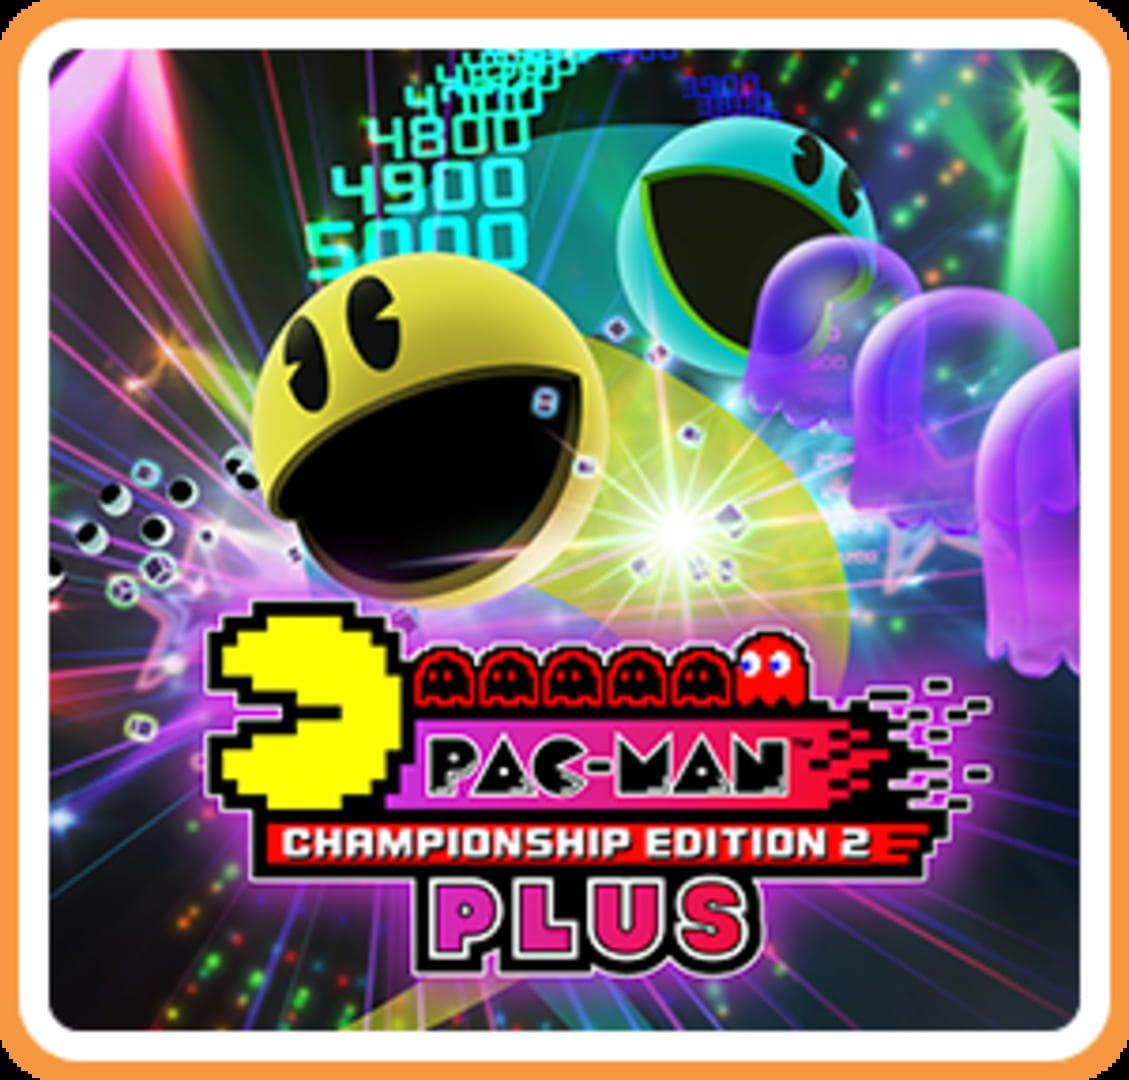 buy Pac-Man Championship Edition 2 Plus cd key for all platform